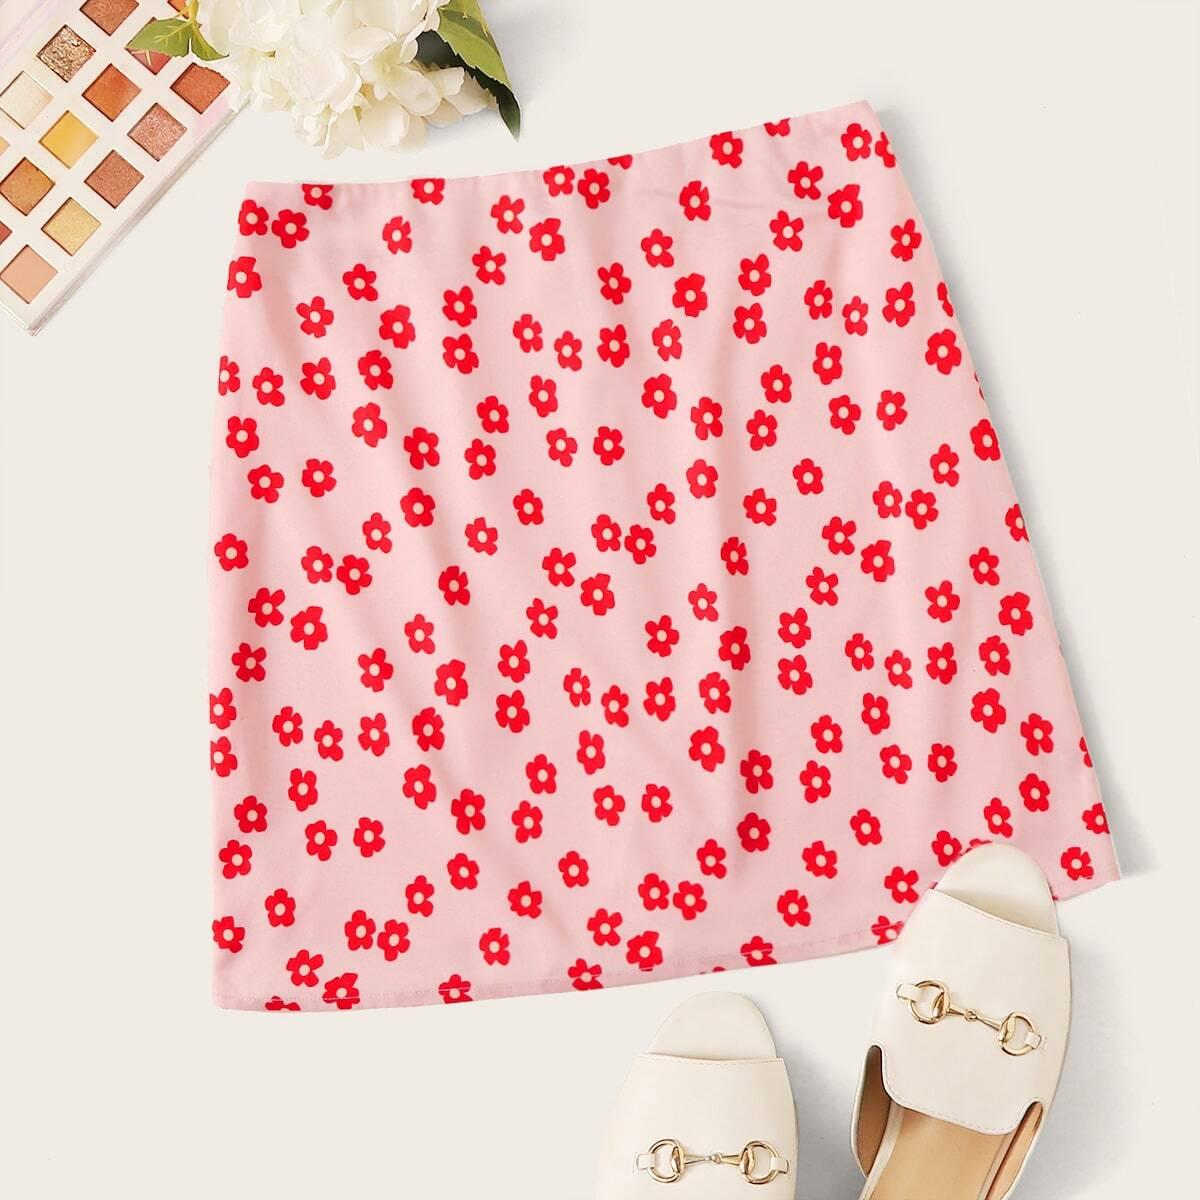 Floral Print Zippered Mini Skirt